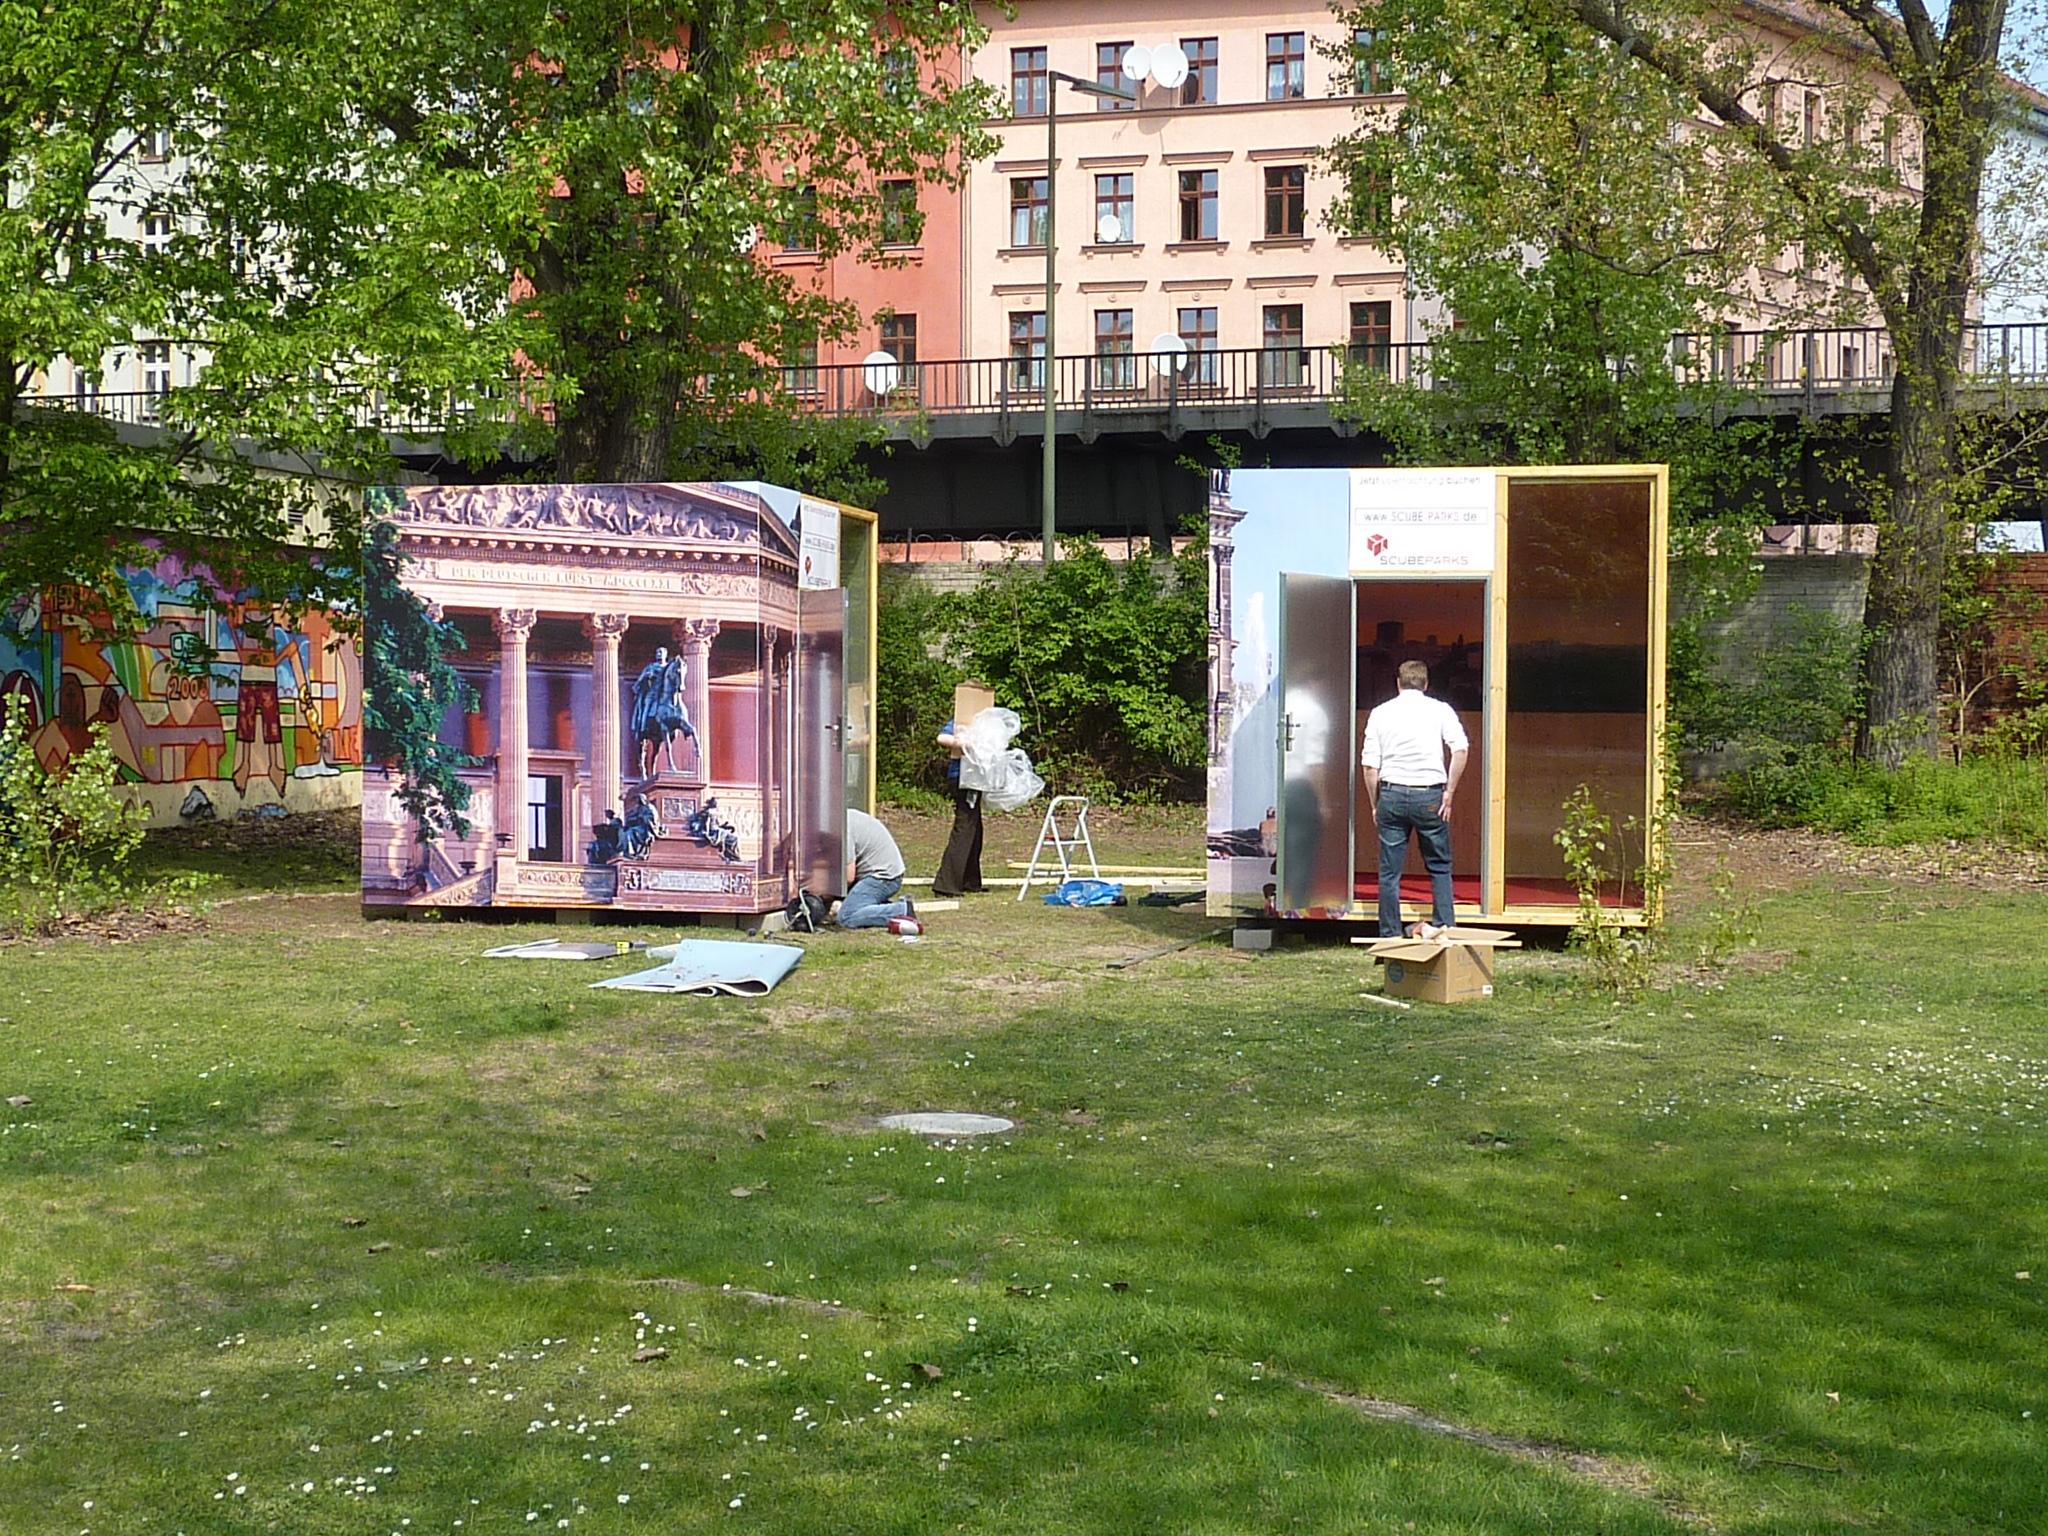 prinzenbad blog scube park im prinzenbad. Black Bedroom Furniture Sets. Home Design Ideas